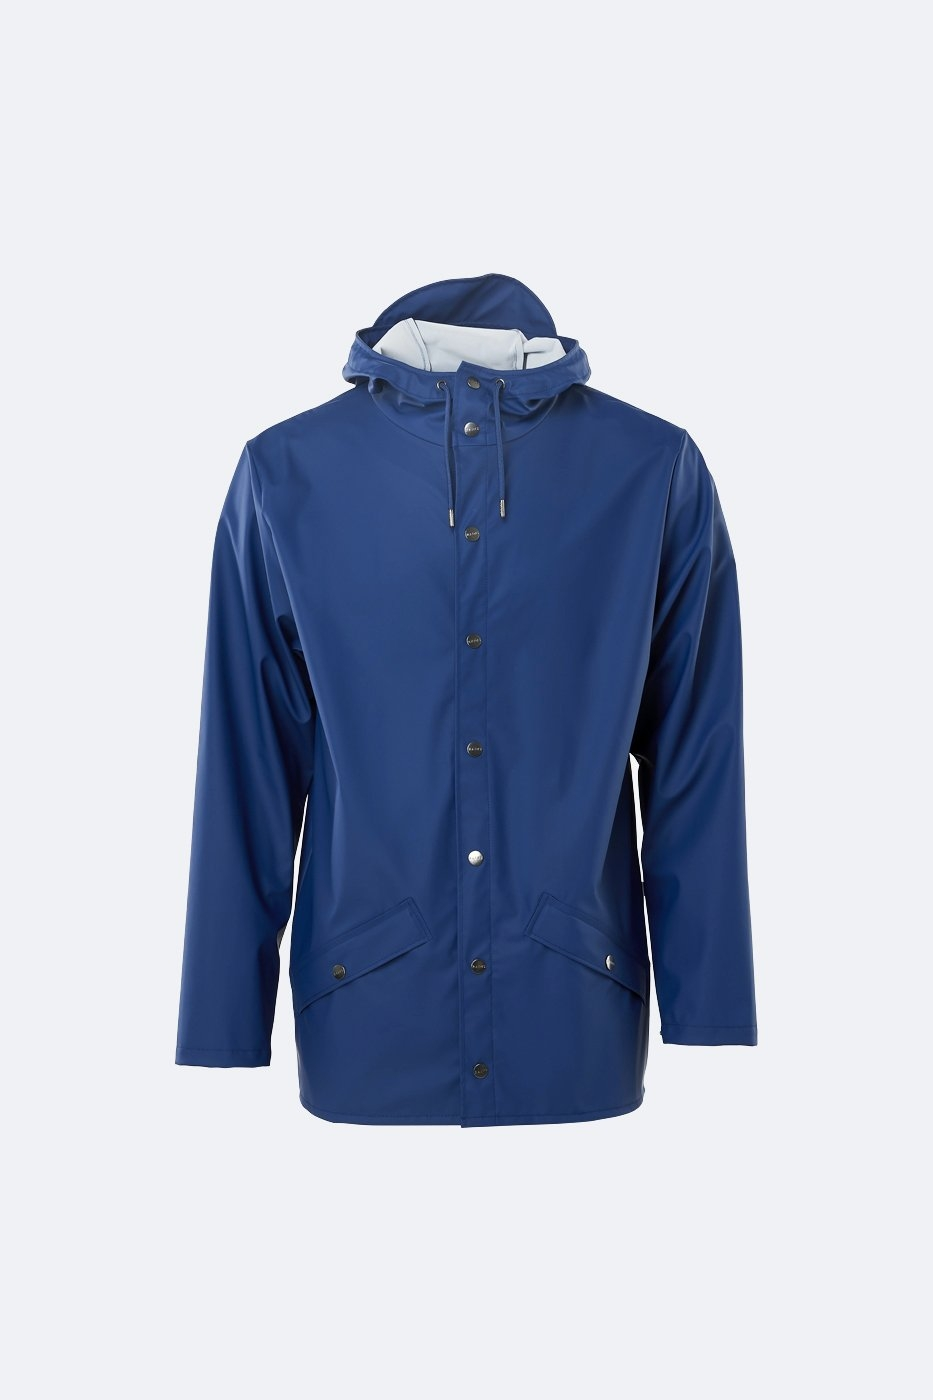 Rains Jacket true blue unisex XS/S